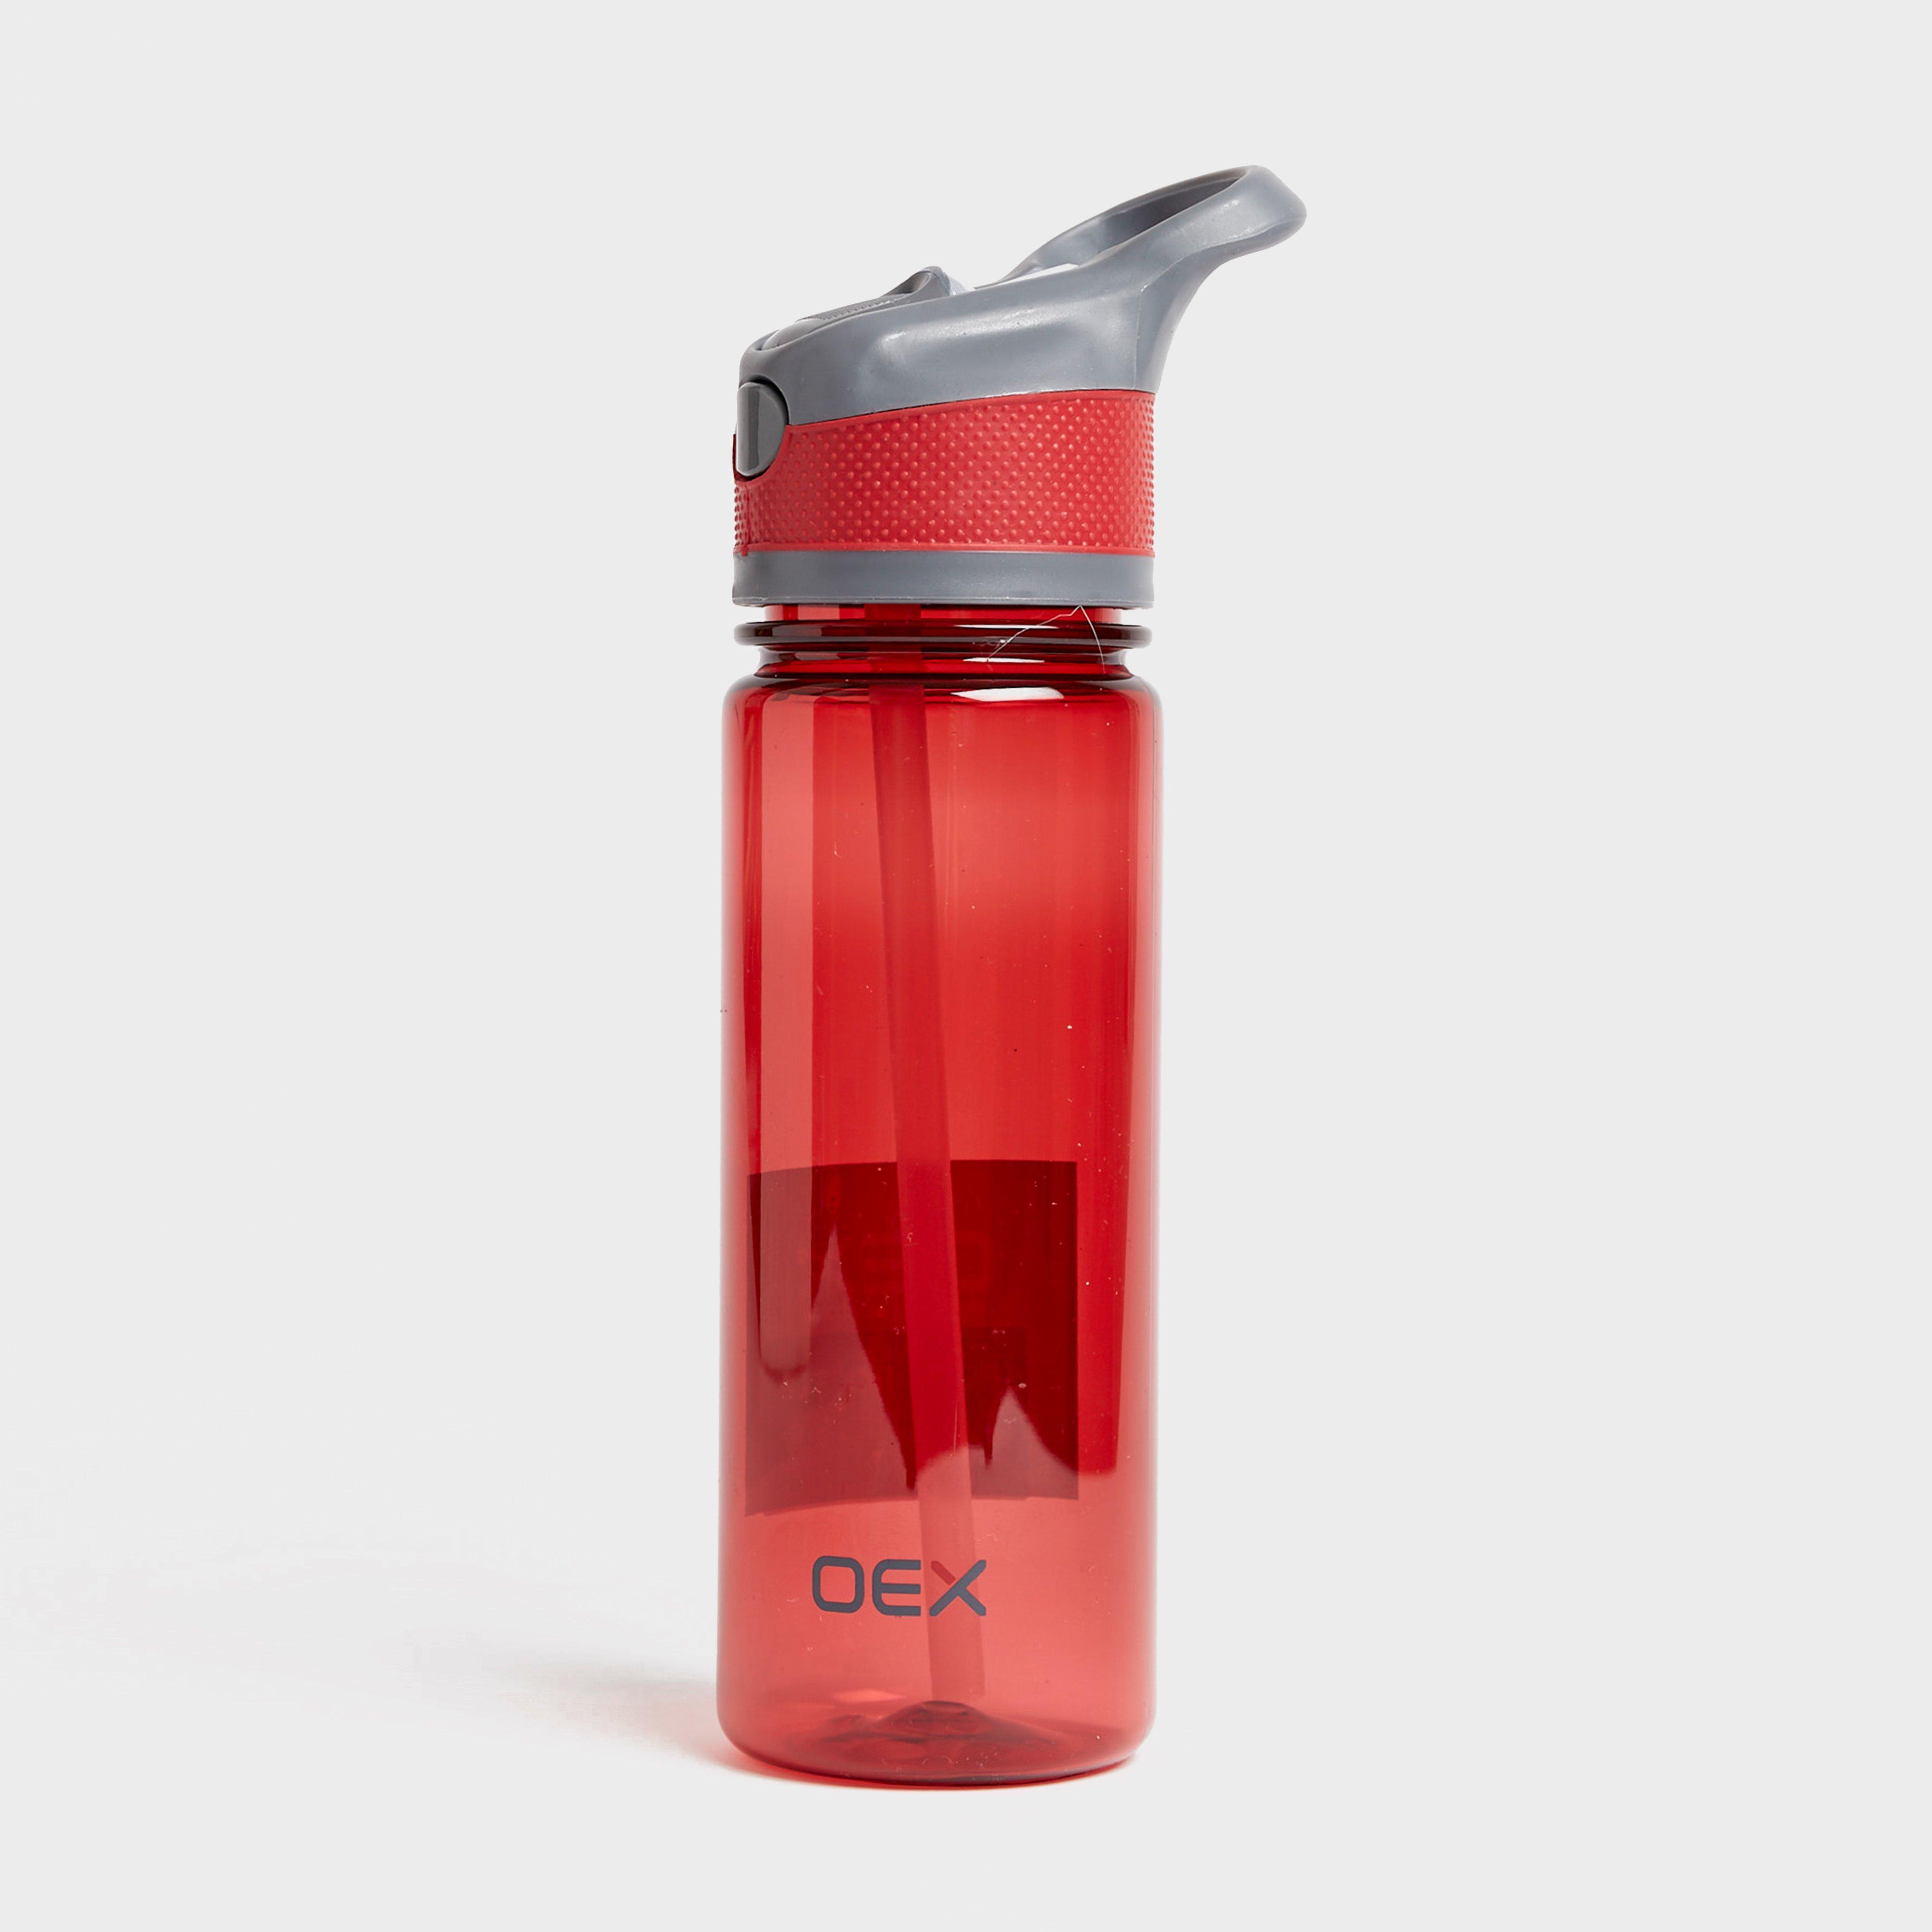 Oex Oex Spout Water Bottle (700ml), Red